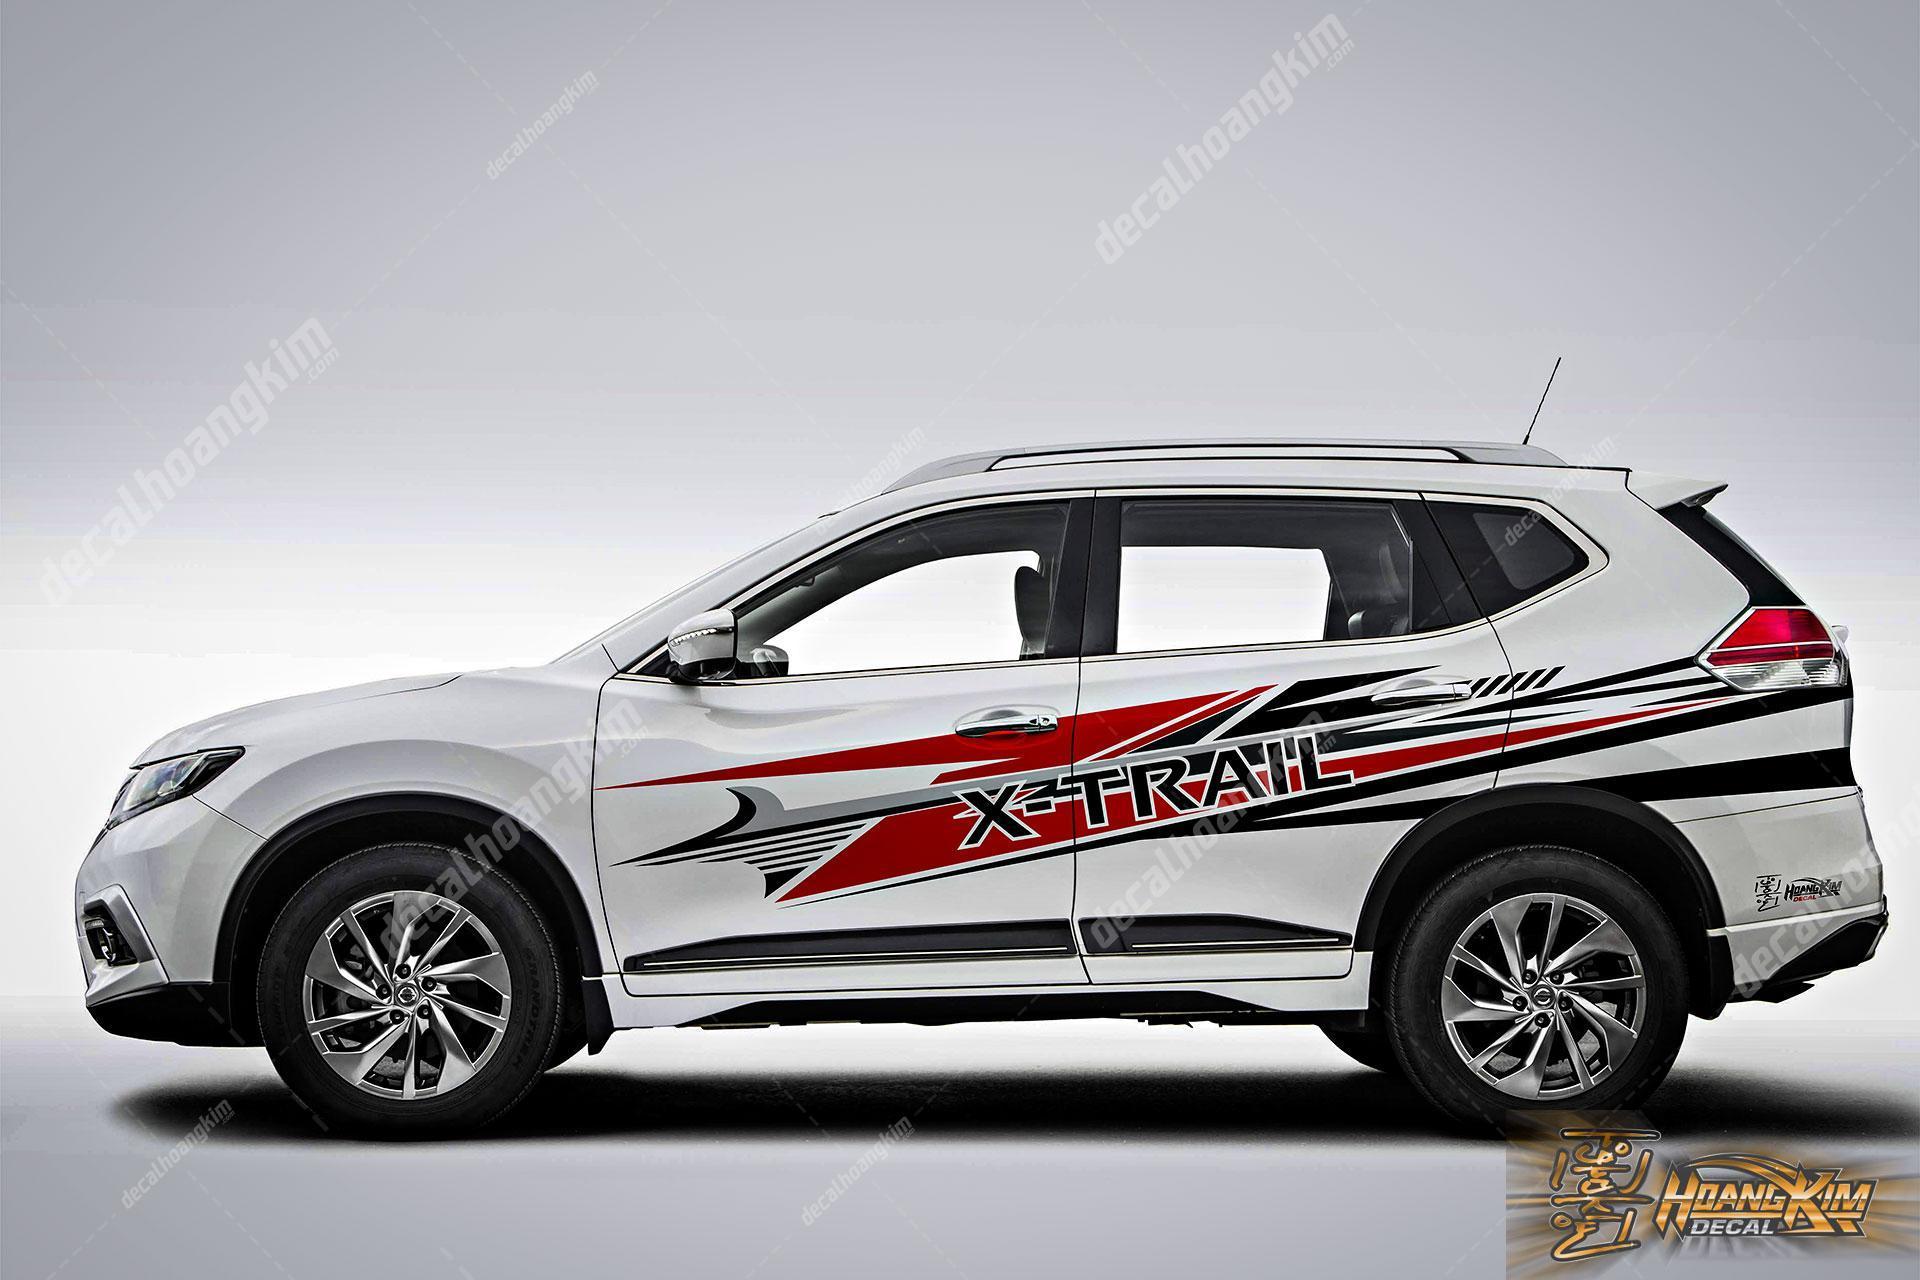 https://hoangkims5.blob.core.windows.net/otohoangkimzag152hg18/Tem-xe-Nissan-X-Trail-NXT003.jpg